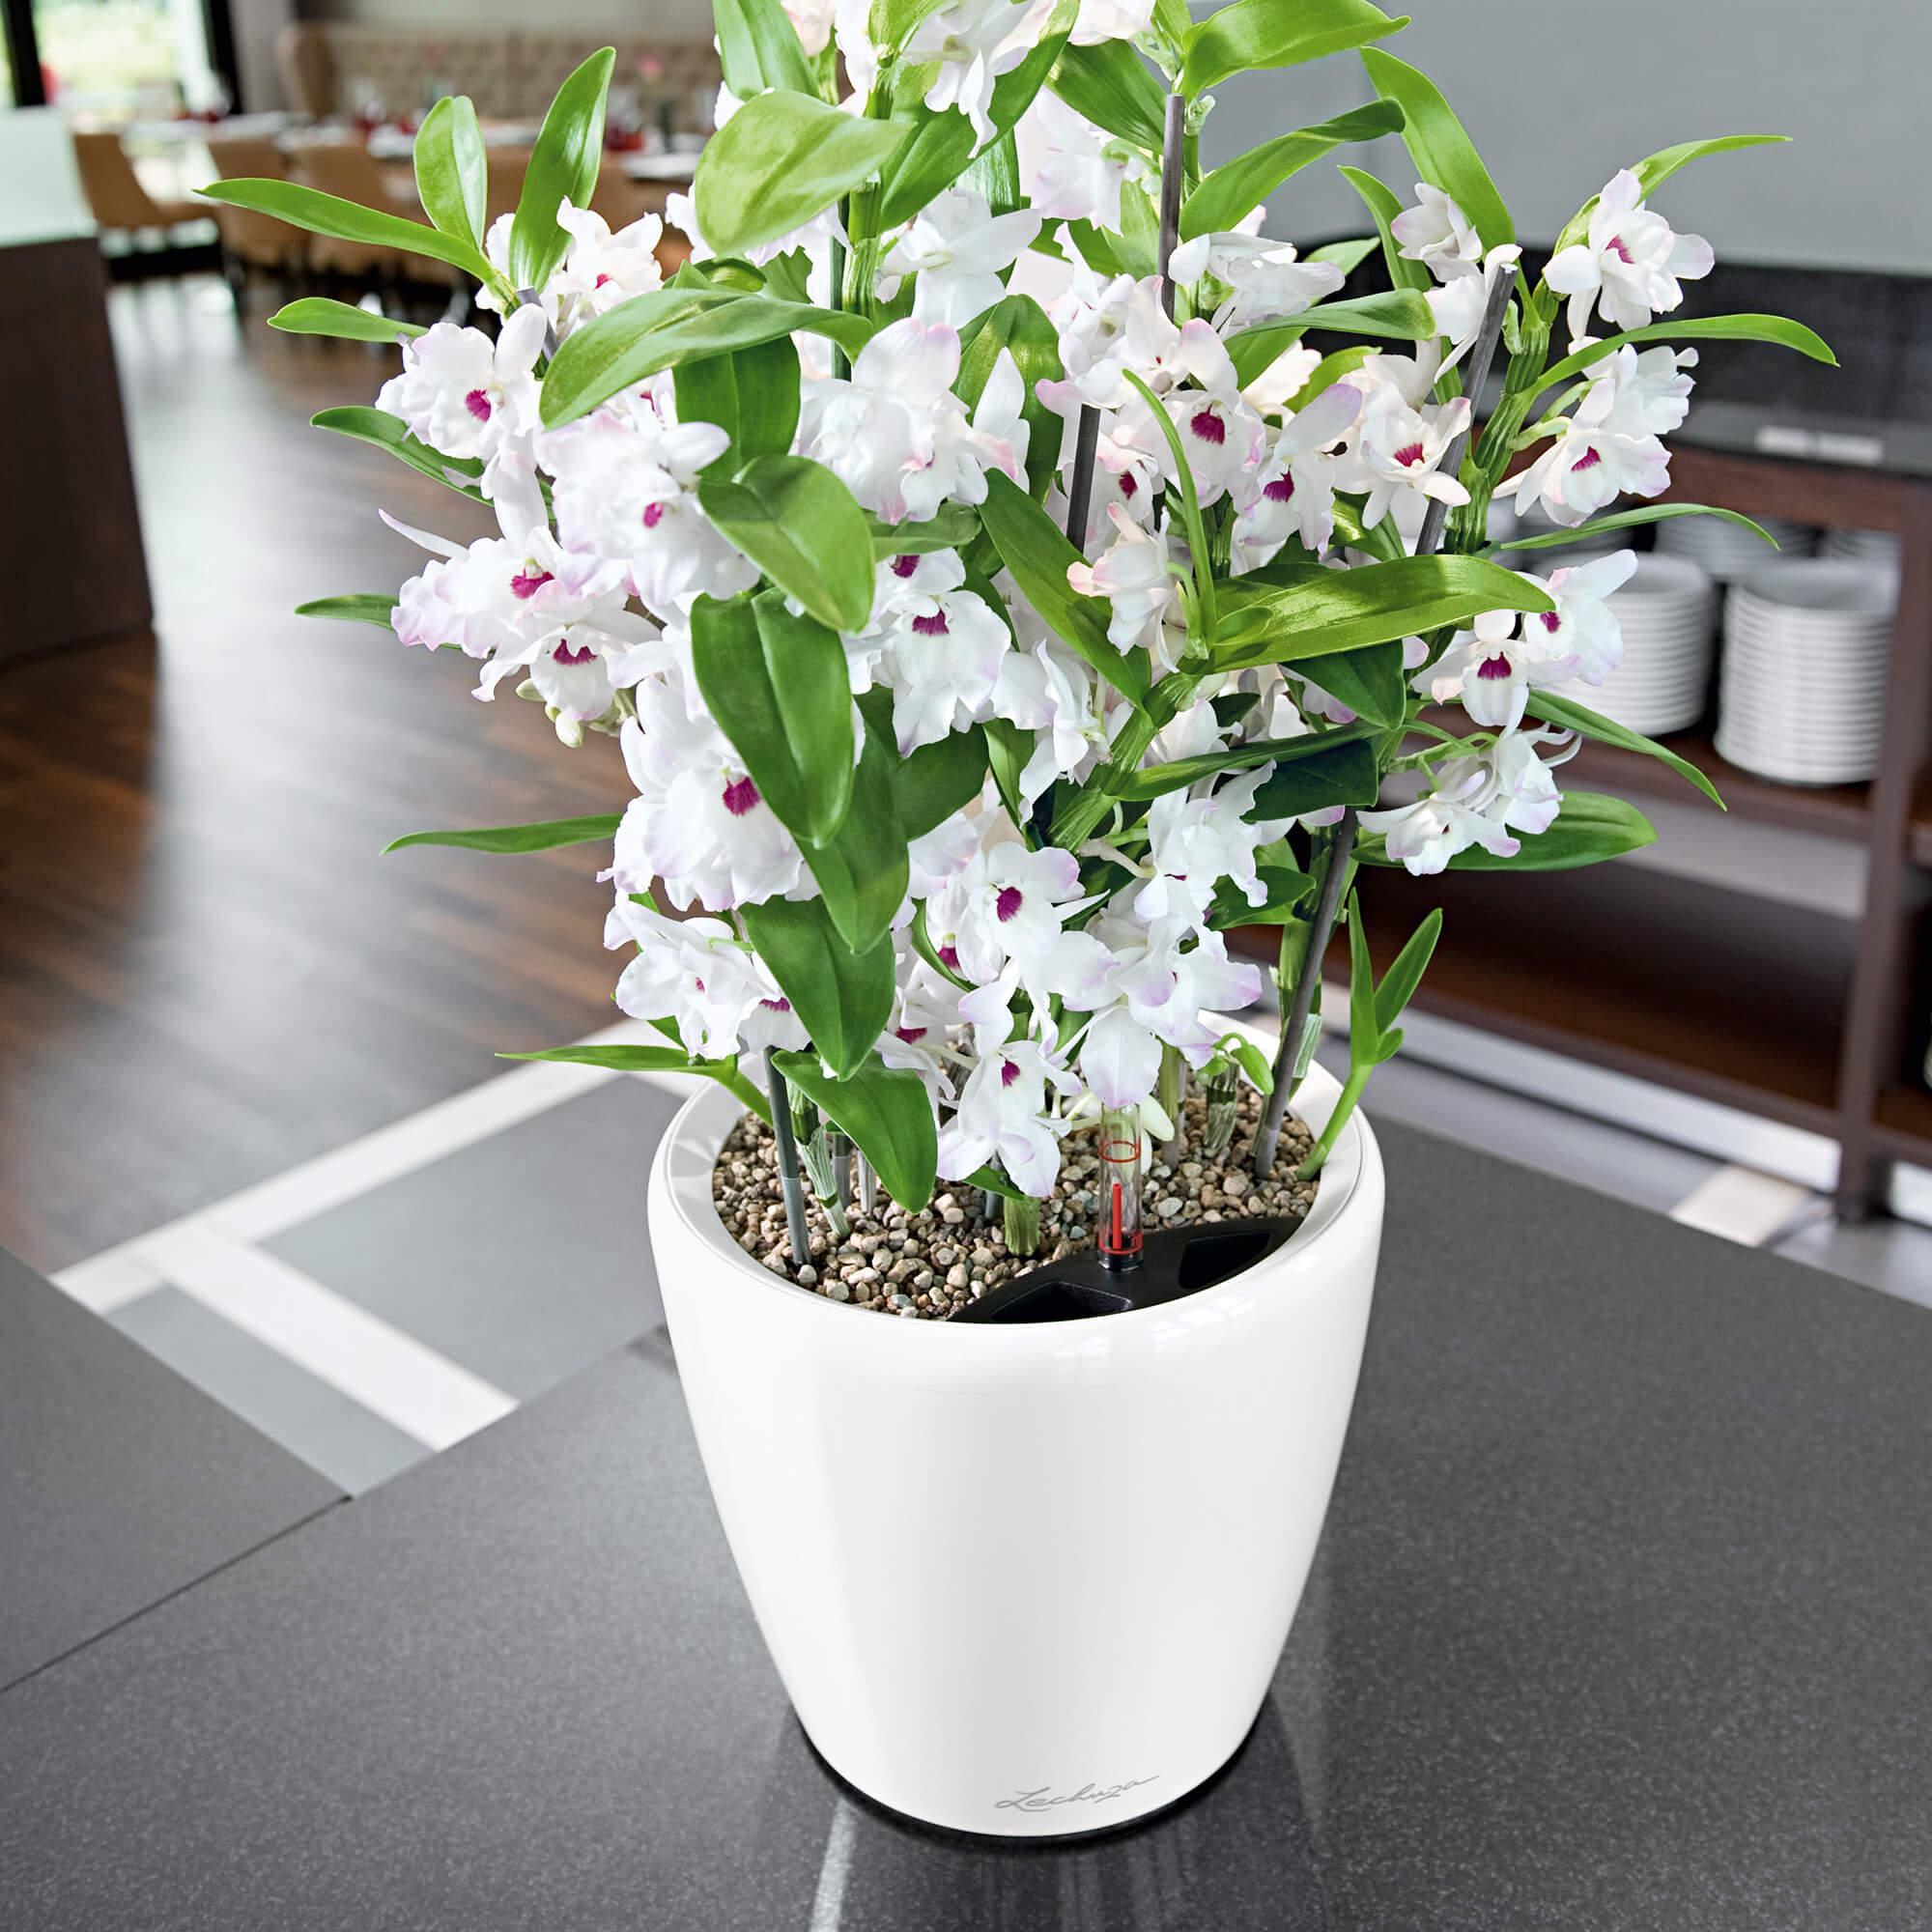 CLASSICO LS 21 white high-gloss - Image 4